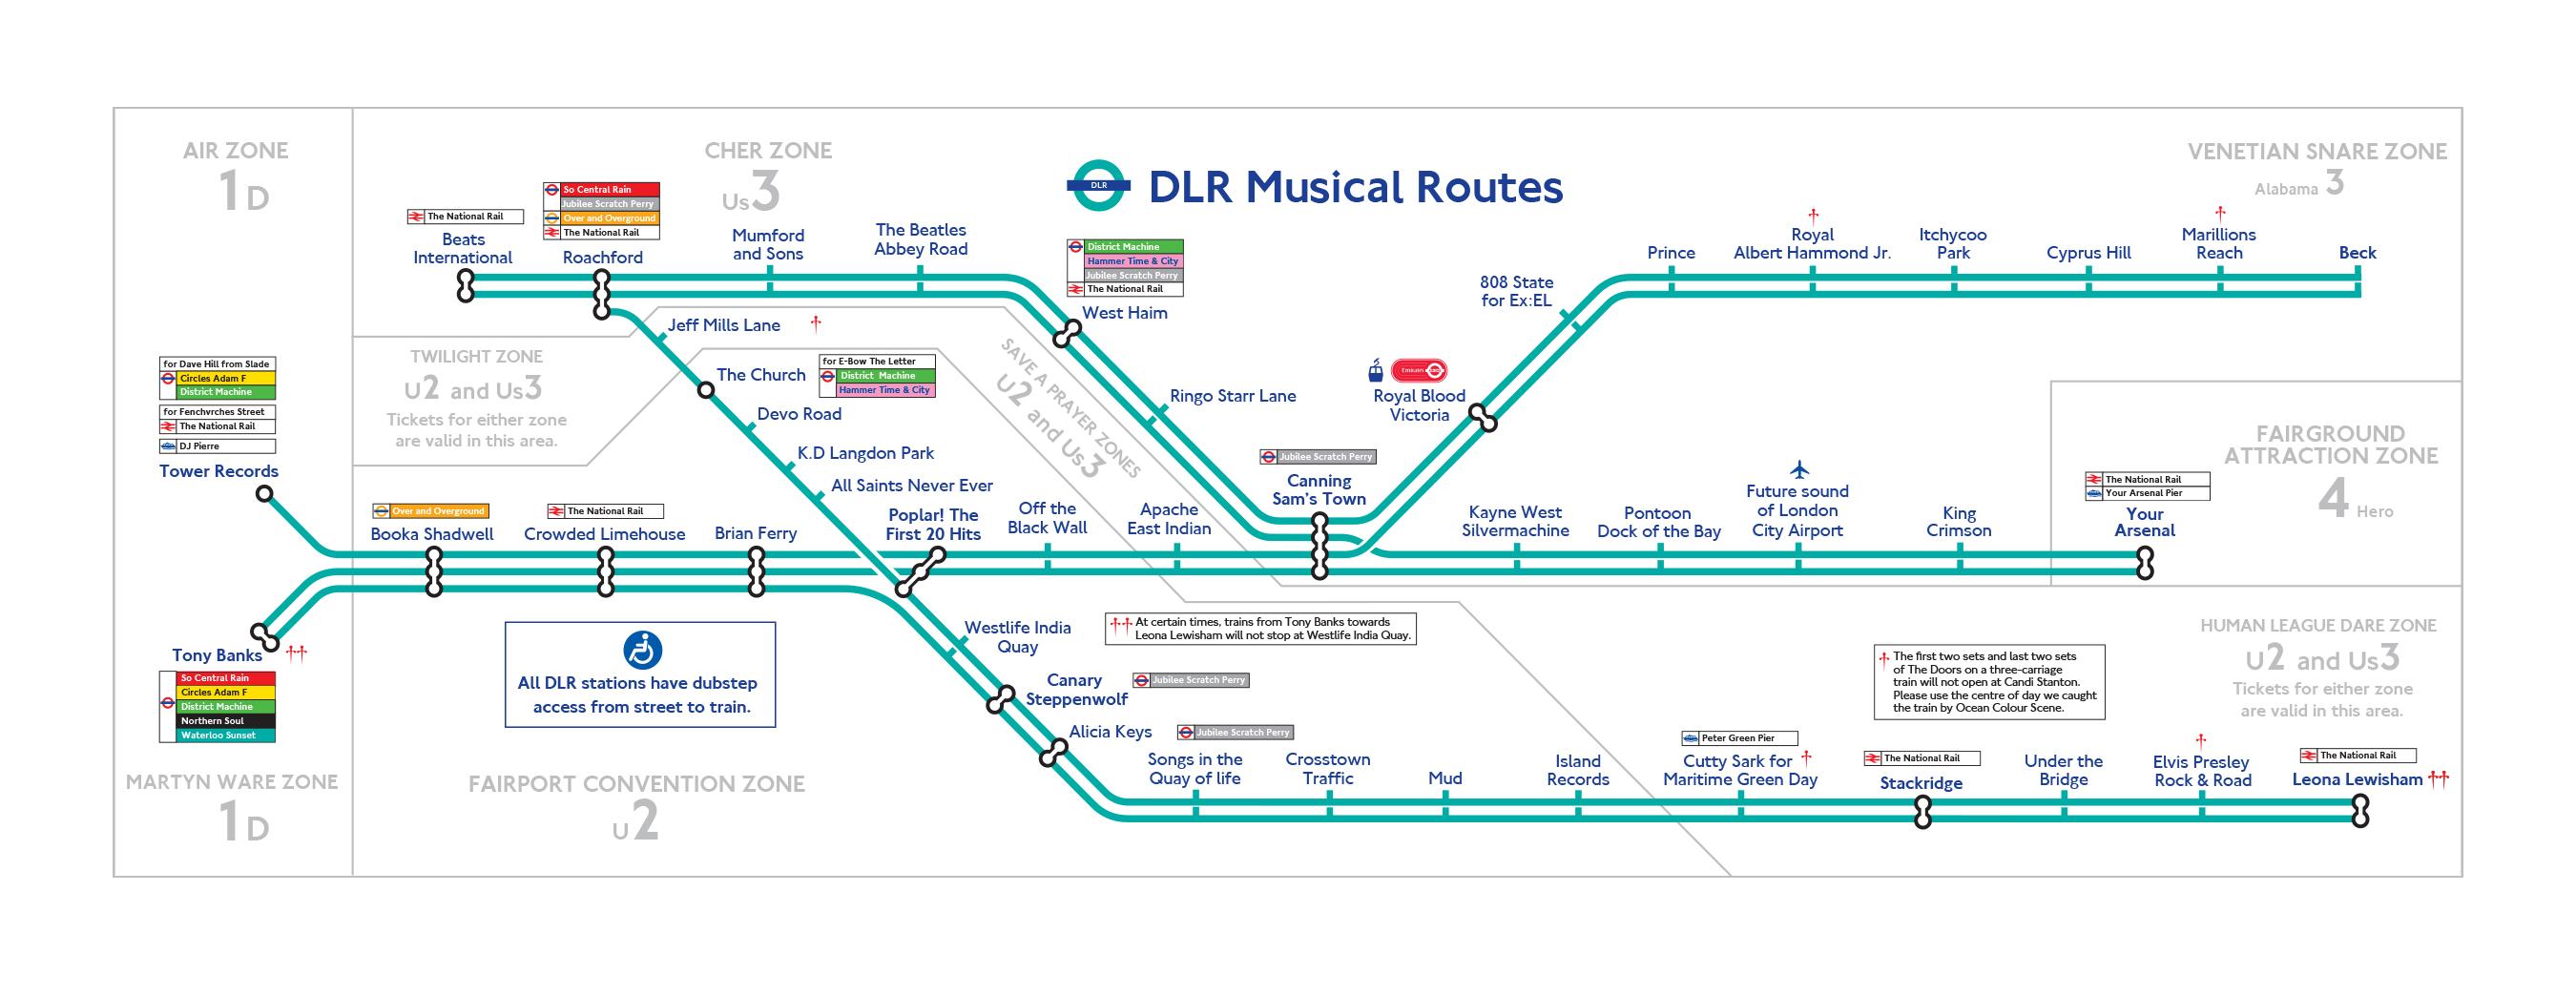 DLR Musical London Underground Map - London dlr map